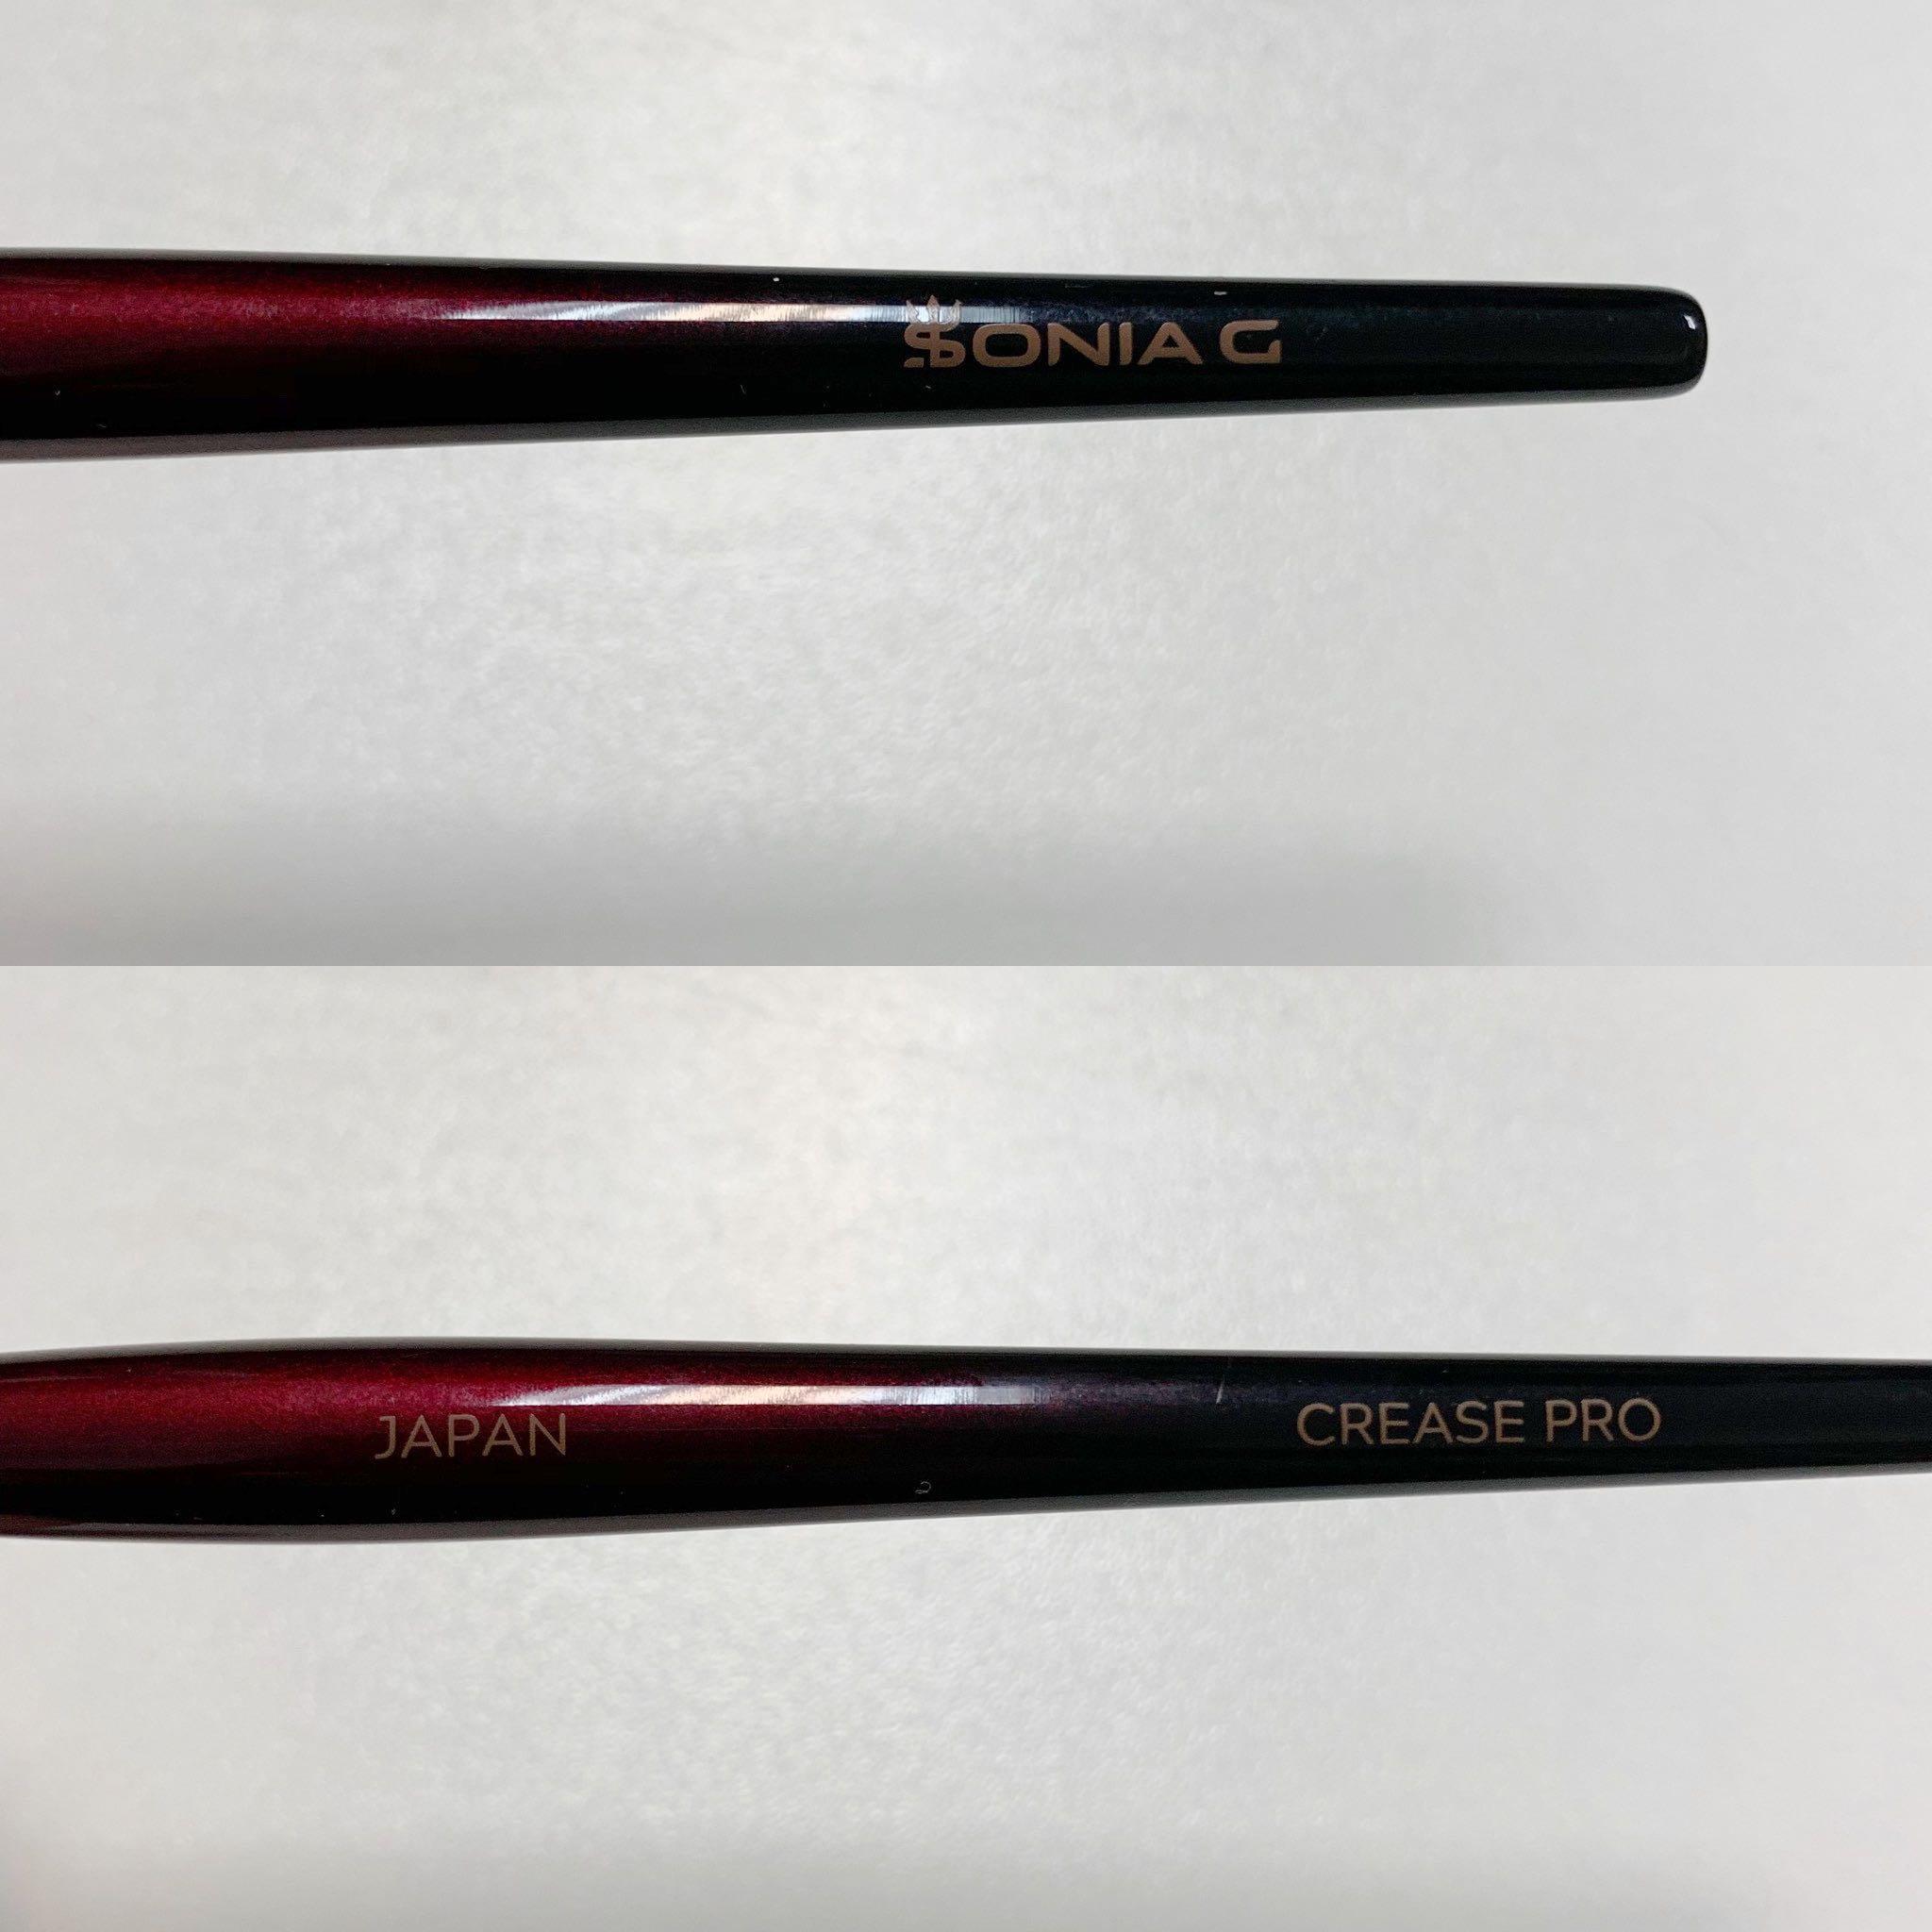 Sonia G. Crease Pro 眼影掃 eyeshadow brush 化妝掃